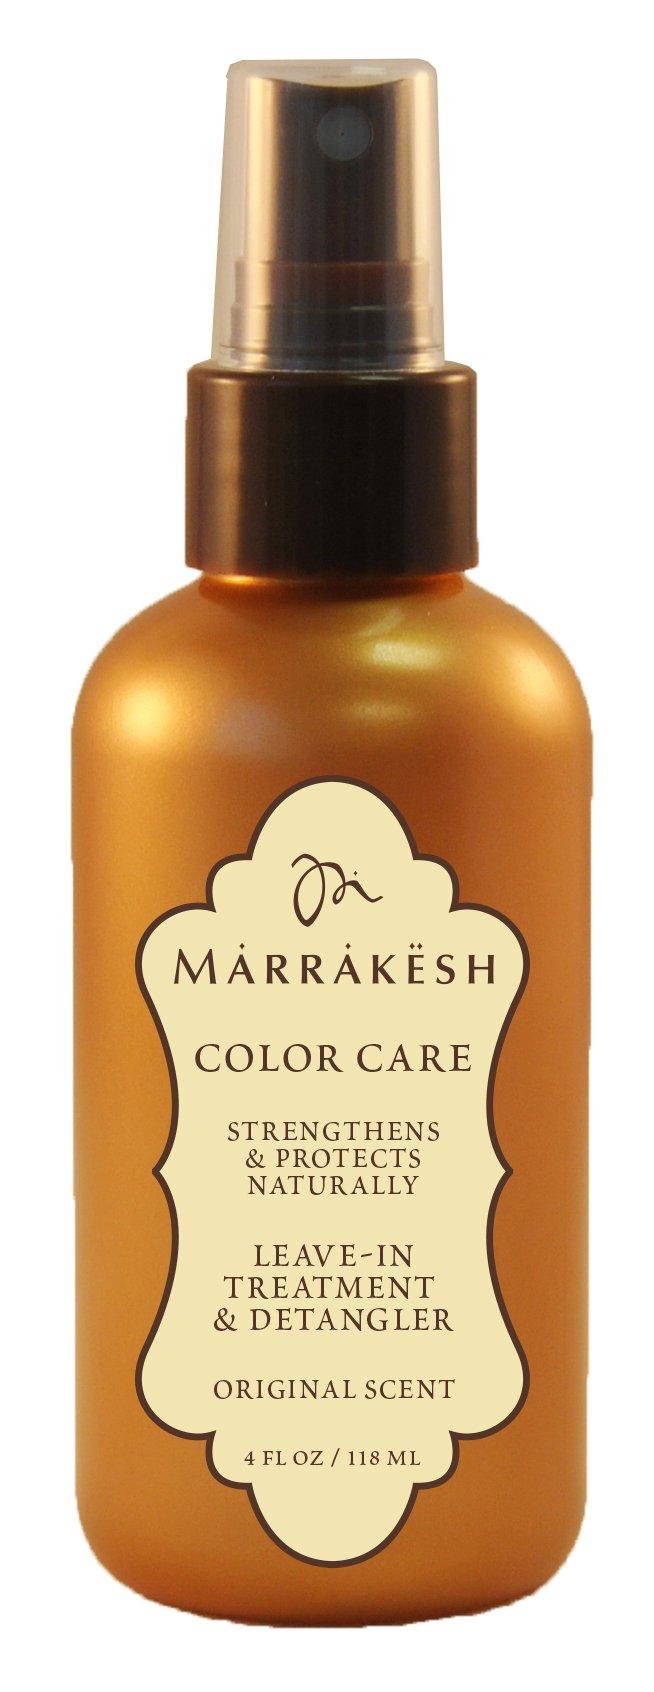 Marrakesh Hair care Color Care Leave-in Detangler